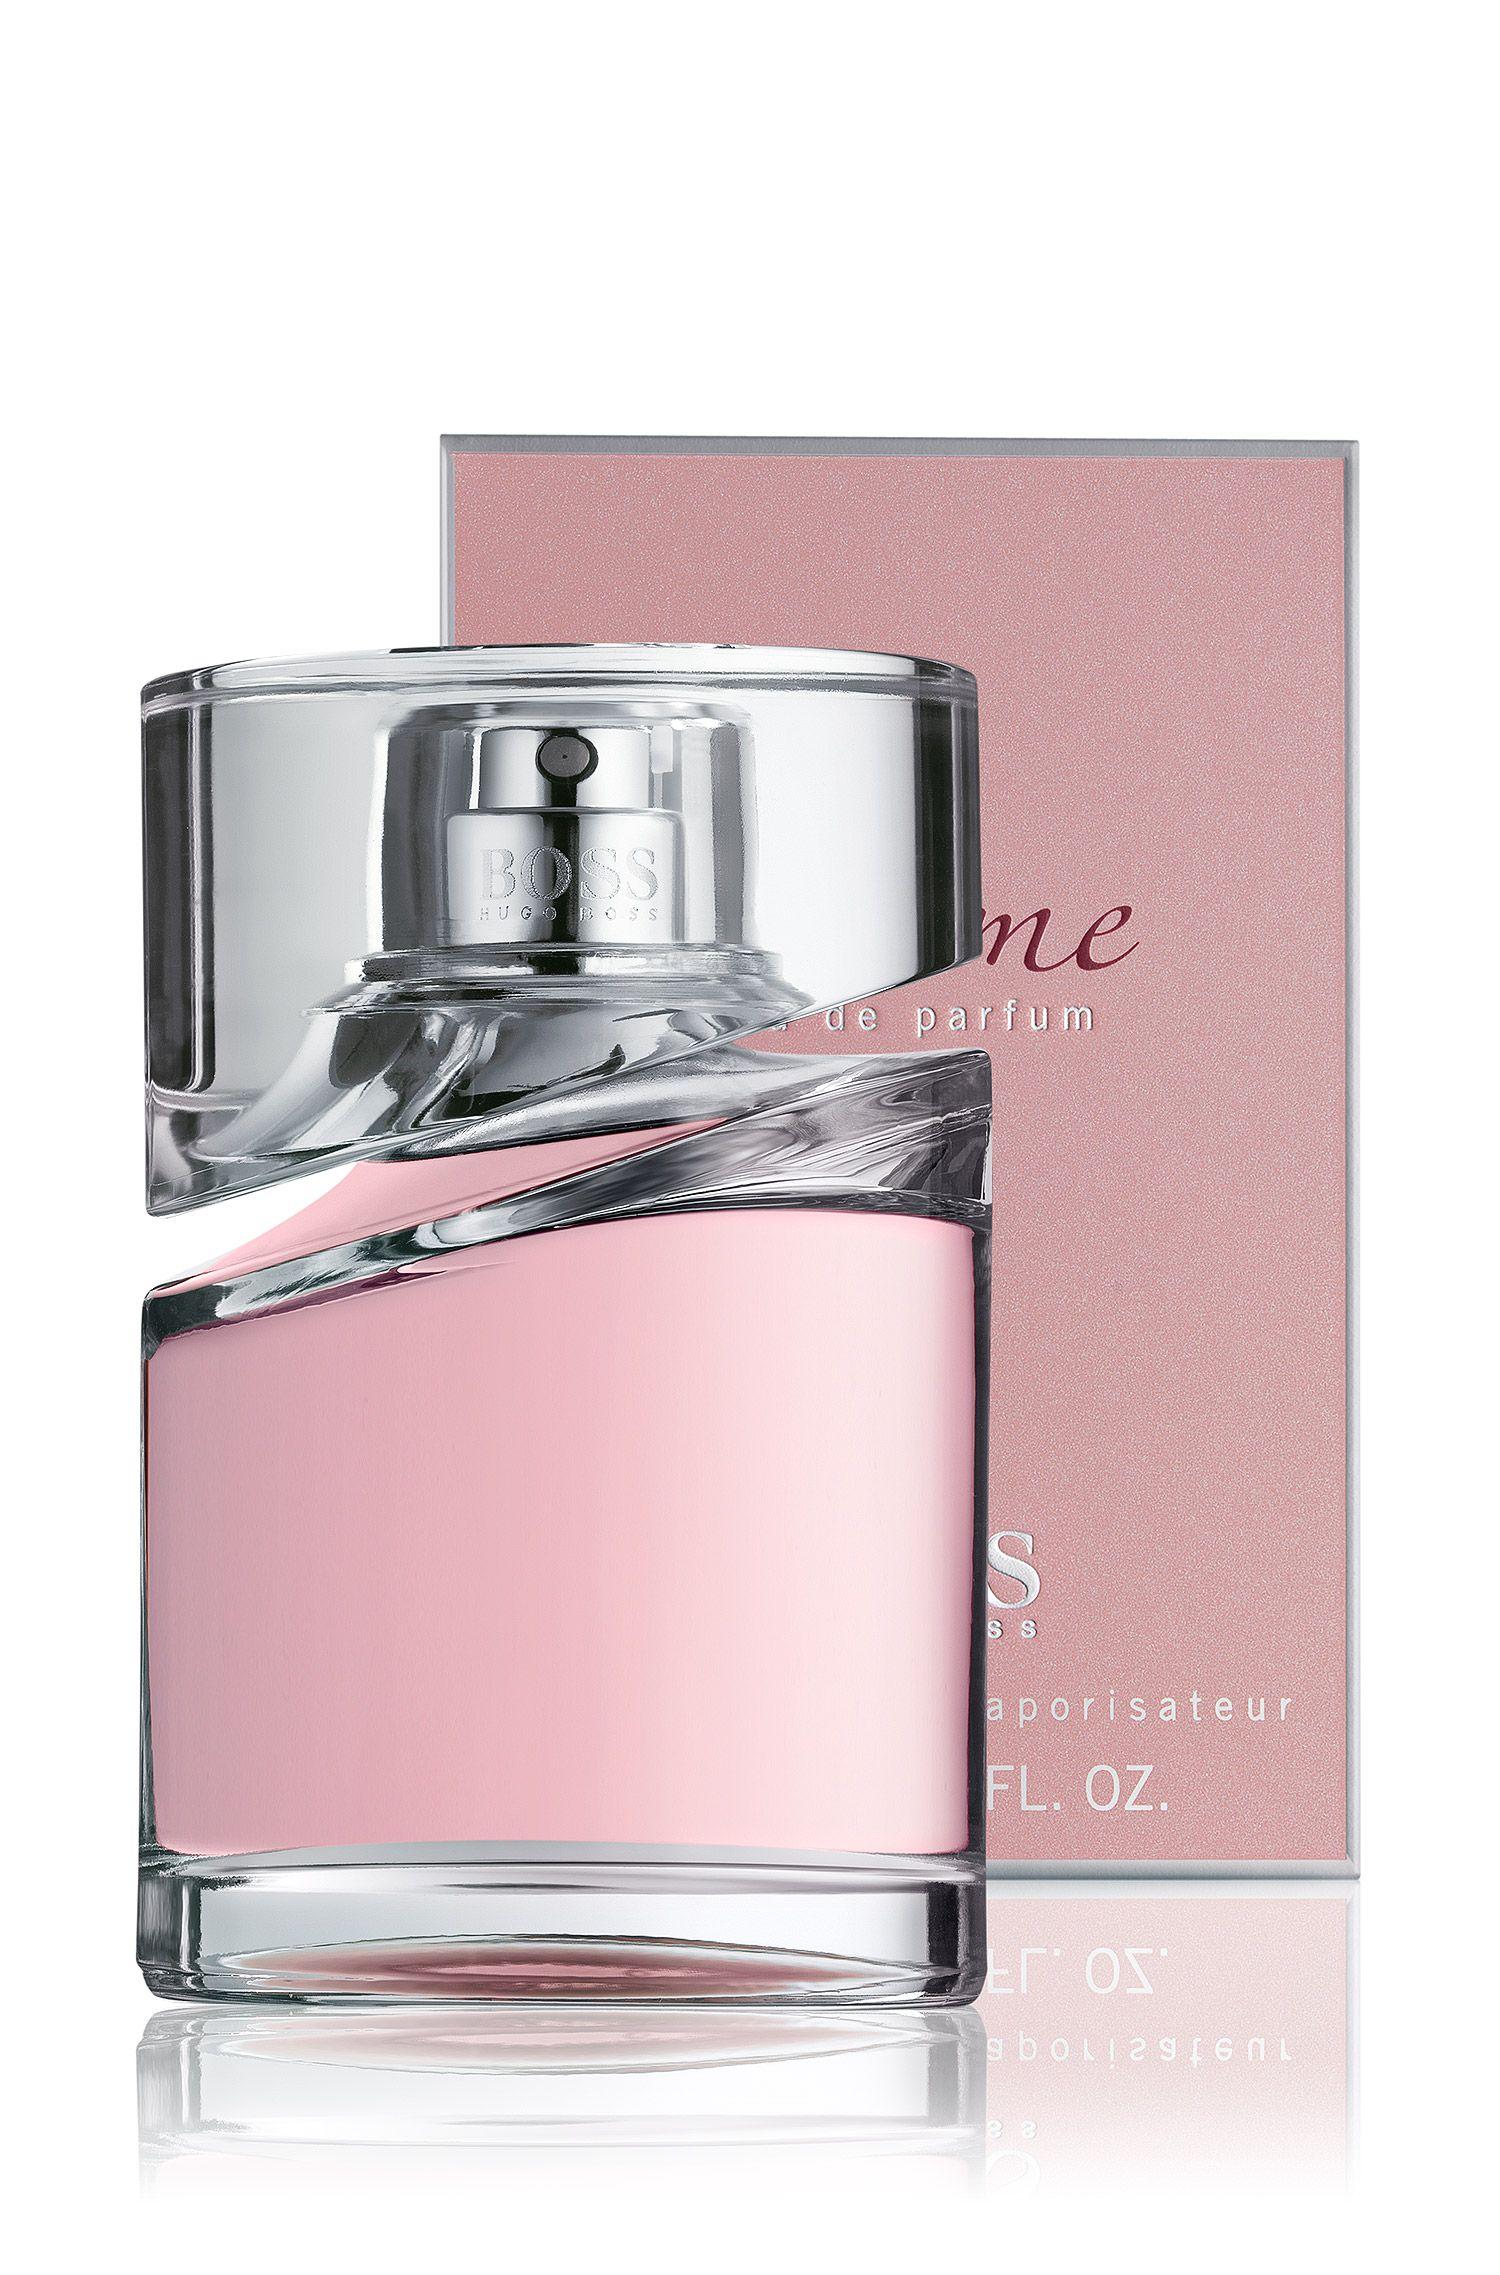 Eau de parfum Femme by BOSS de 75ml